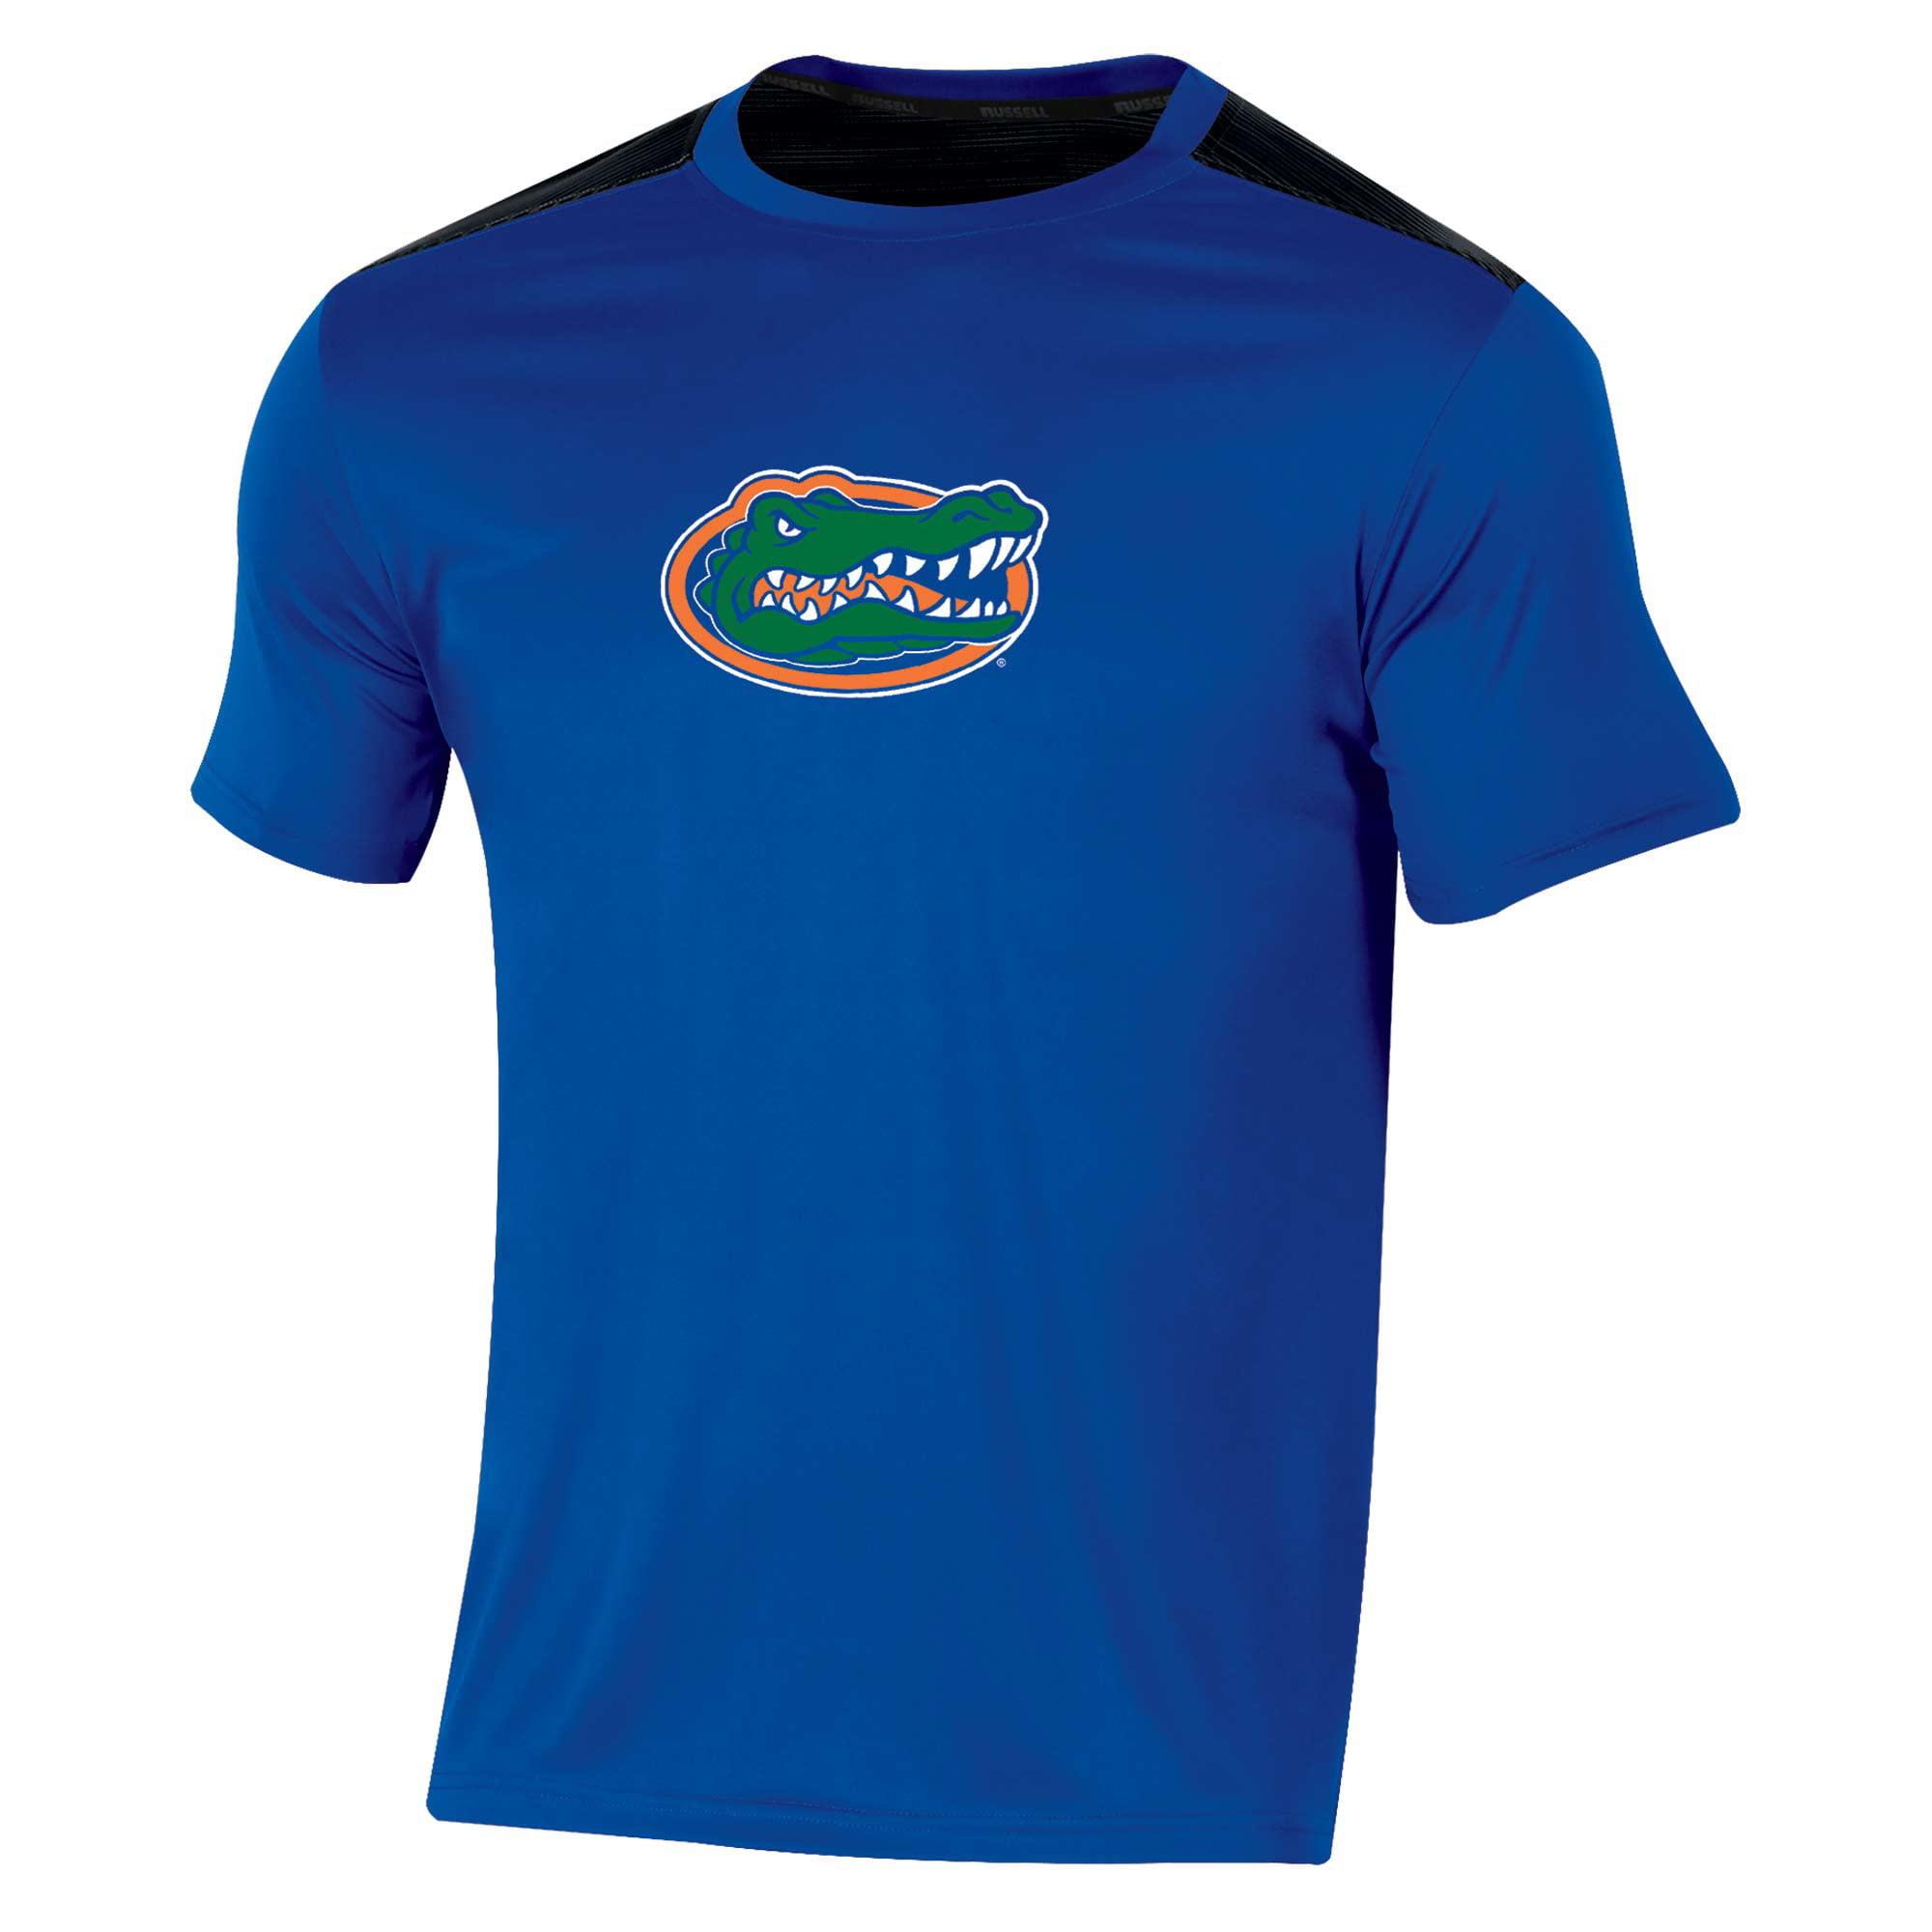 Men's Russell Royal Florida Gators Synthetic Colorblock Crew T-Shirt